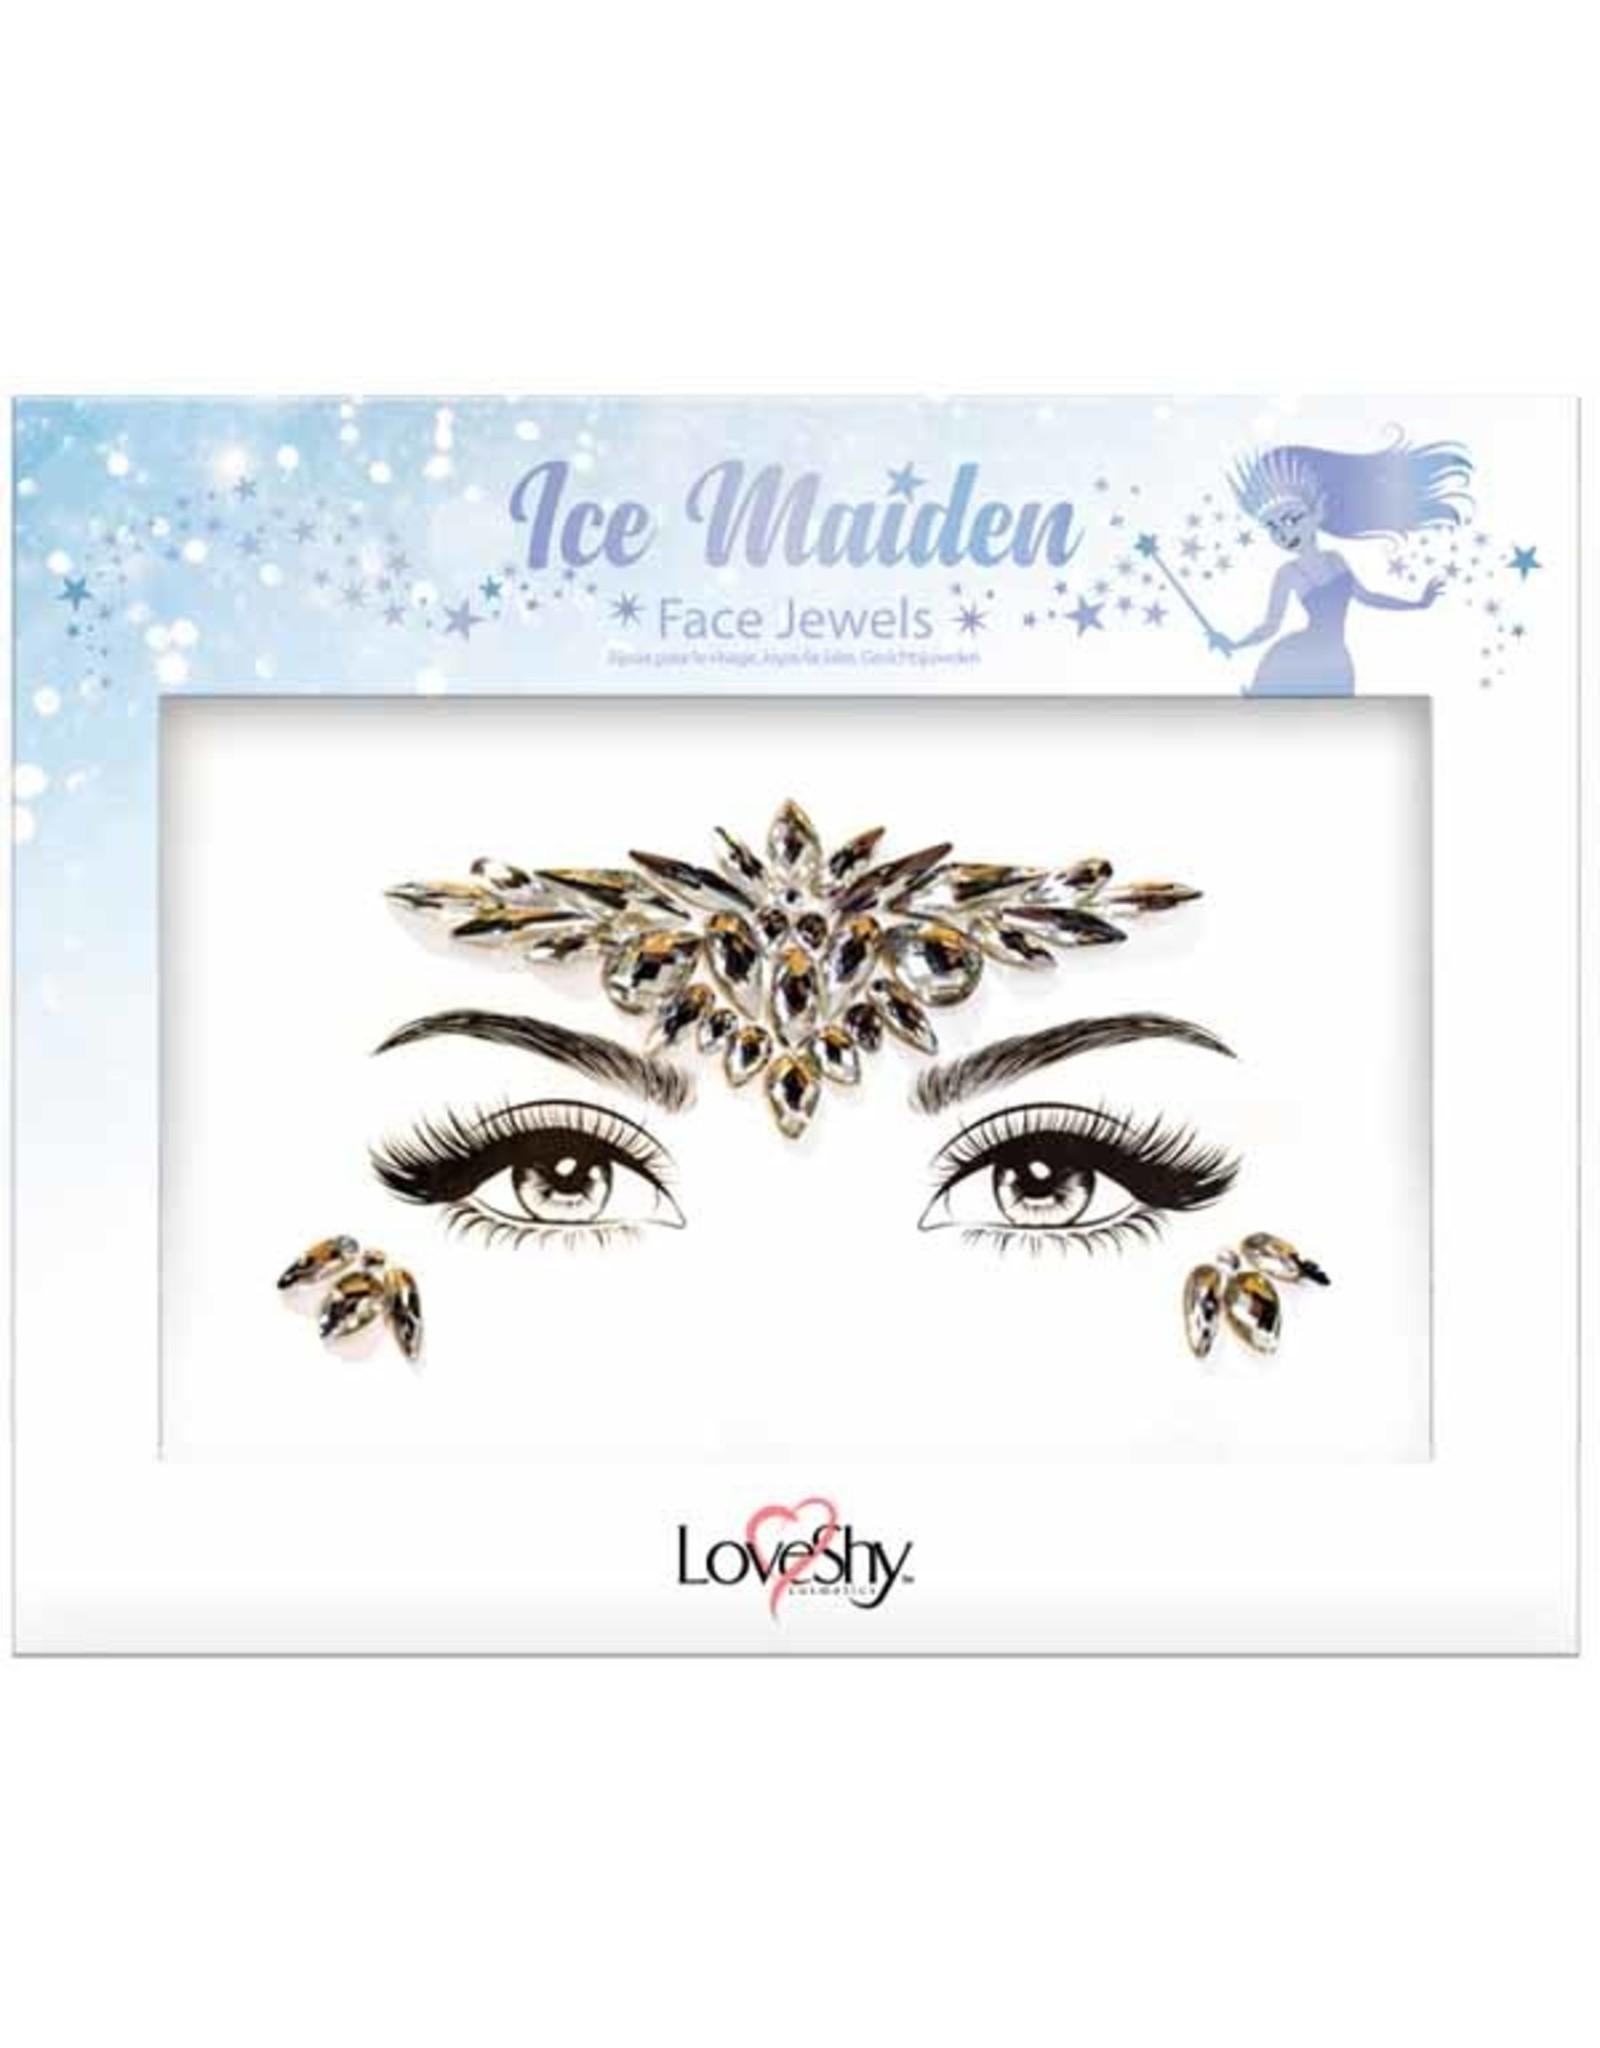 LoveShy Cosmetics Ice Maiden Face Jewels